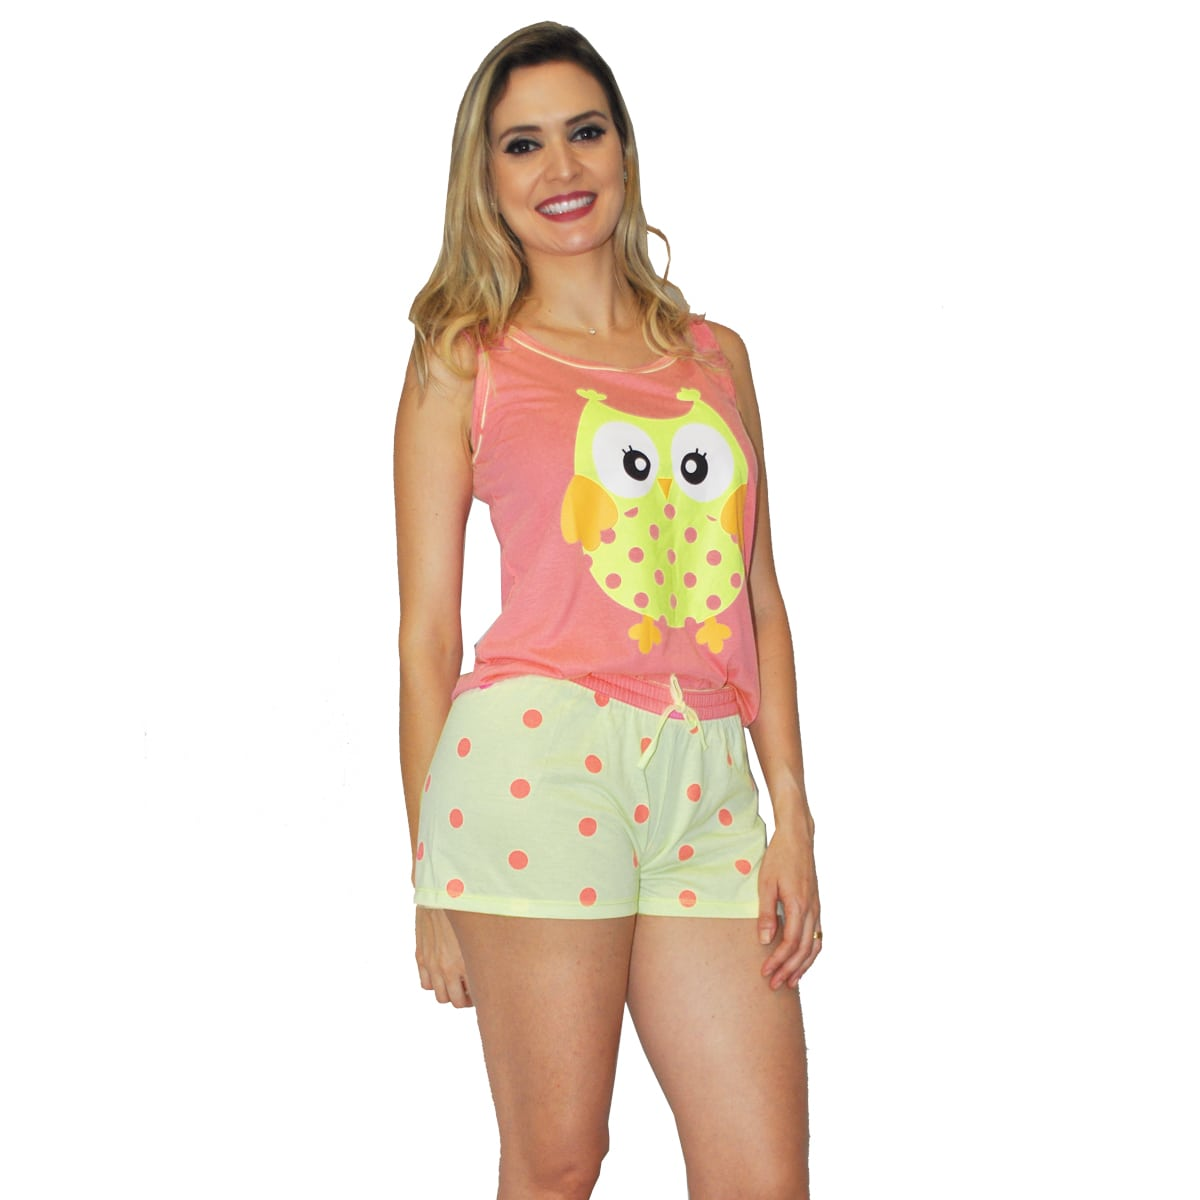 Baby Doll Short Camiseta Feminino Adulto Verão Malha Confortável Coruja Ref: 320